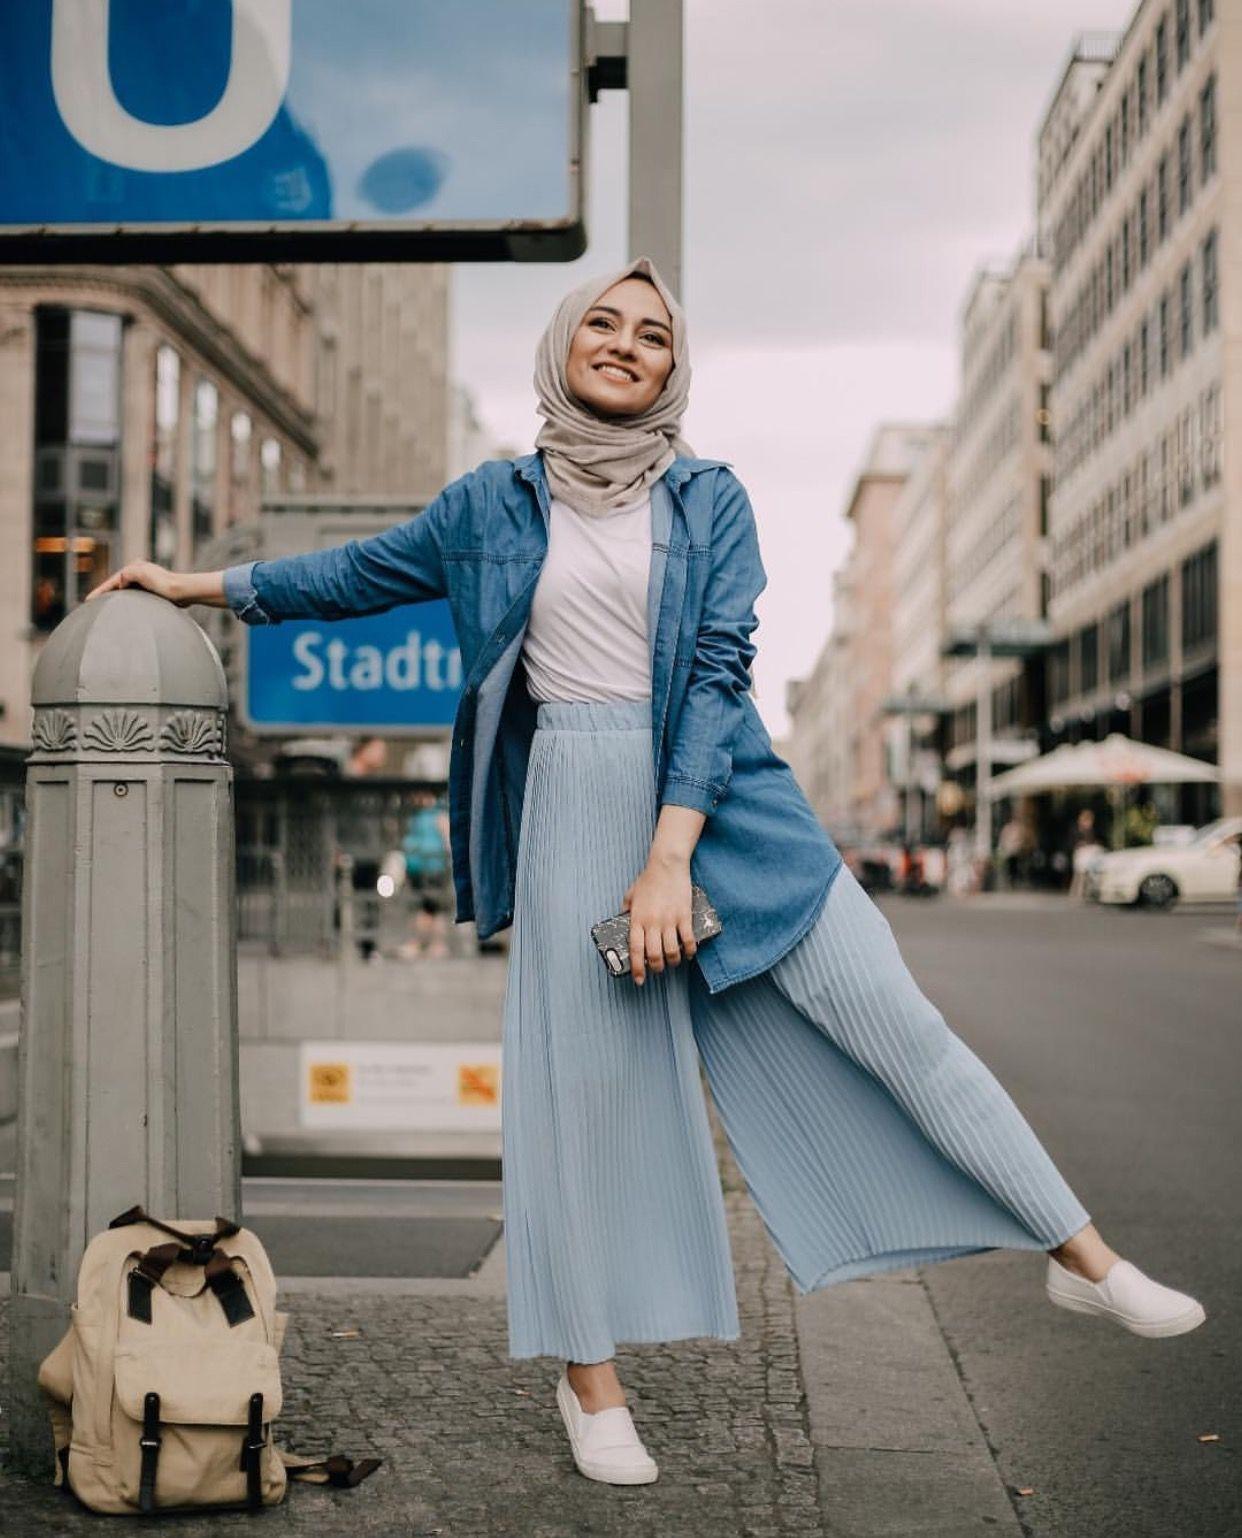 White Top Tucked In Pastel Blue Pleated Pants Oversized Denim Shirt Tendencies Kaos Faith Hitam M As Outerwear Pelin Sarkaya